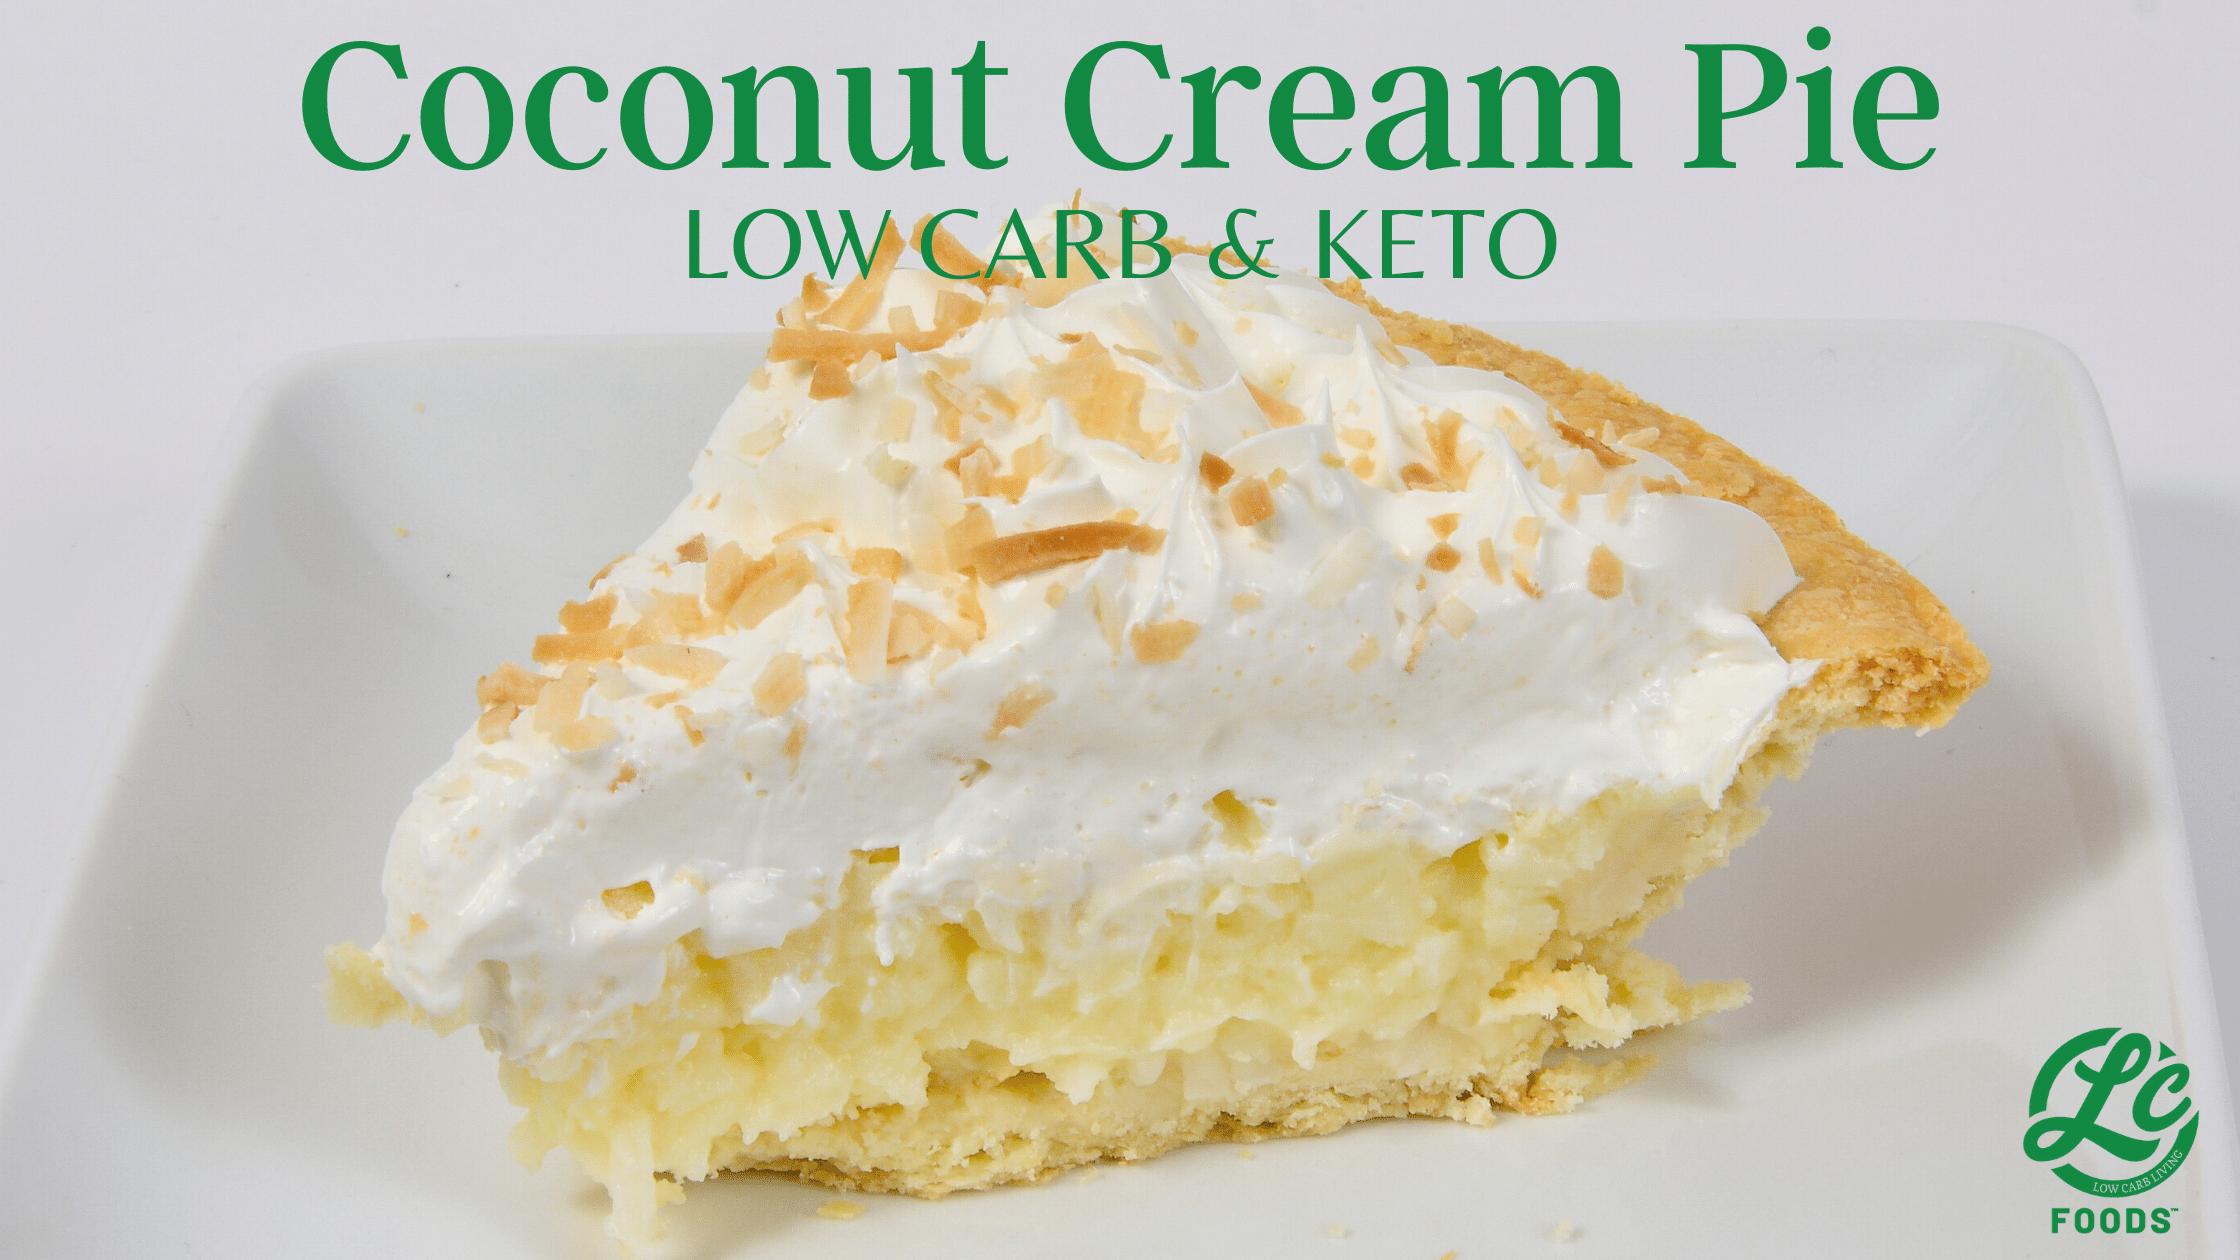 Thumbnail for Keto Coconut Cream Pie